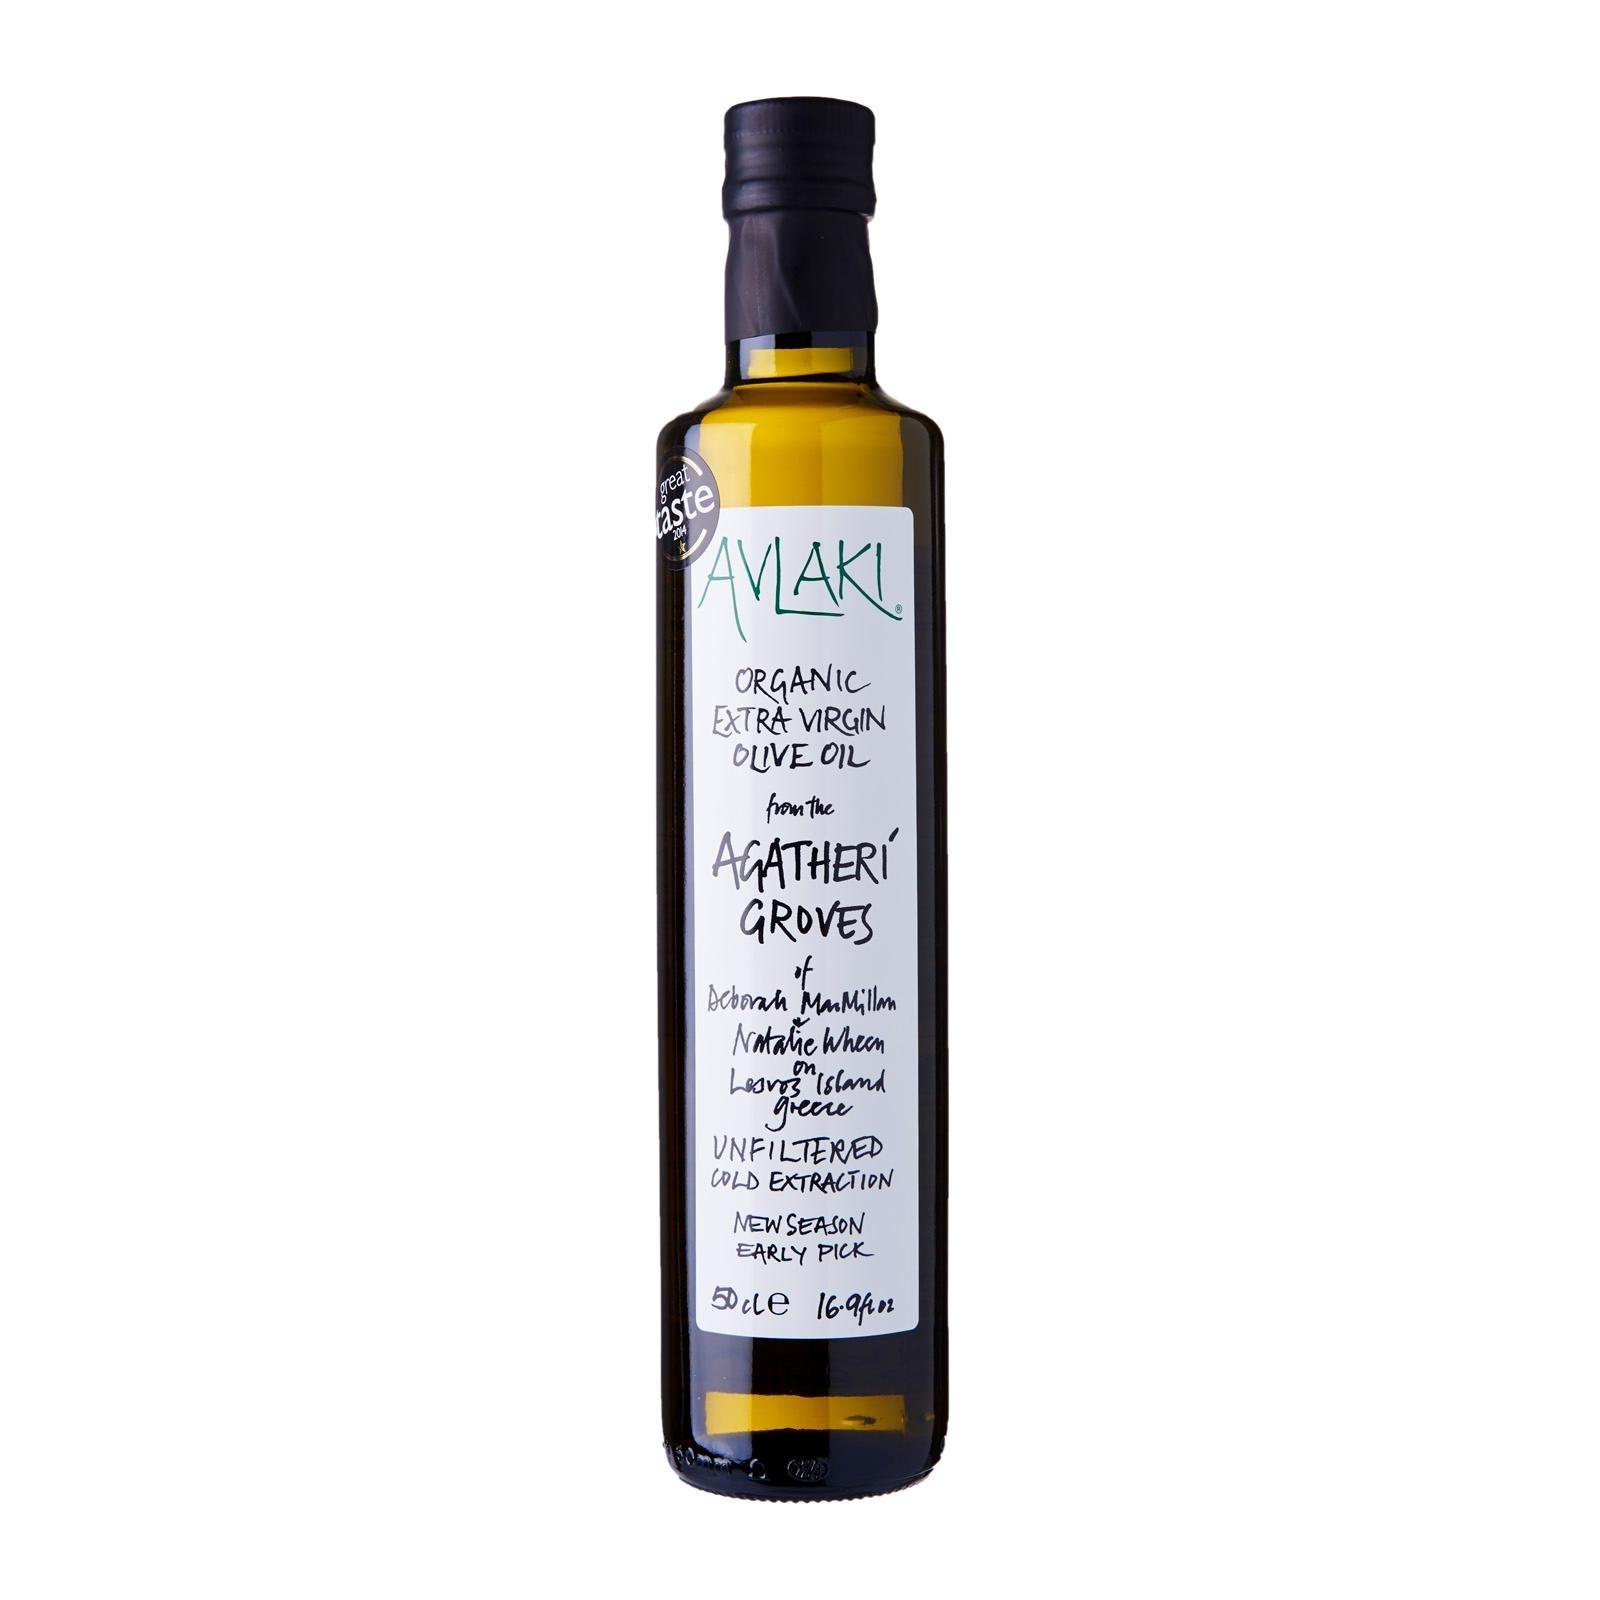 Avlaki Agatheri Groves Extra Virgin Organic Olive Oil